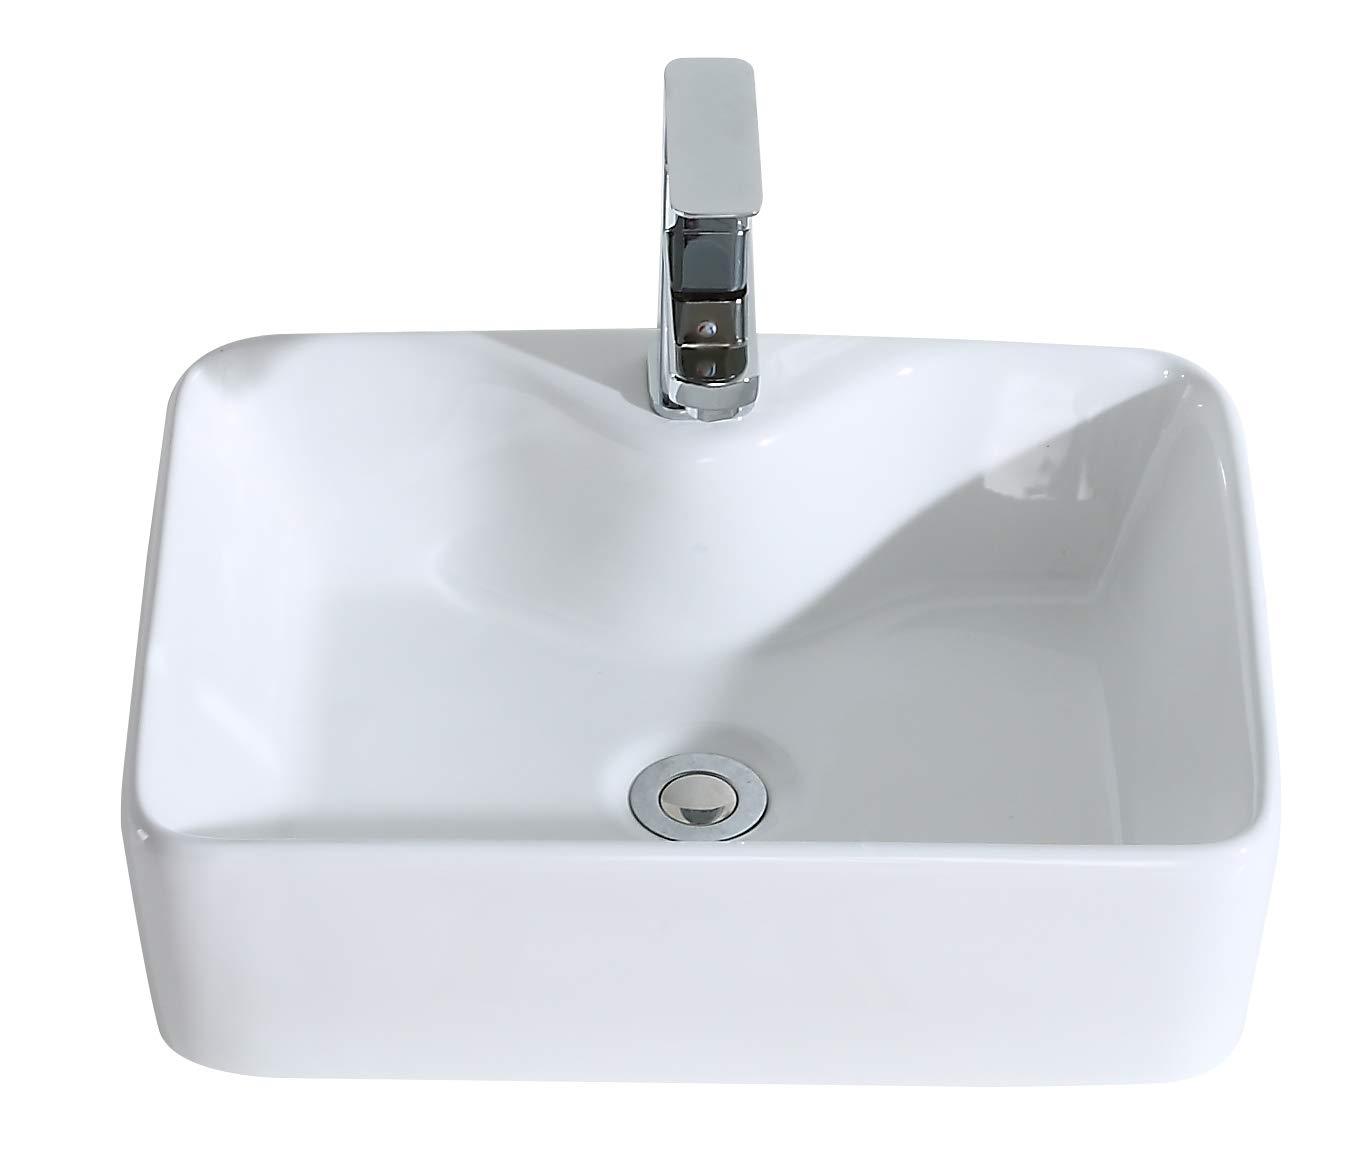 ERIDANUS Wash Basin Sink, Series Rufus-01, Countertop Mounted Wash Basin Sink for Cloakroom Bathroom, 49 X 37 X 14CM